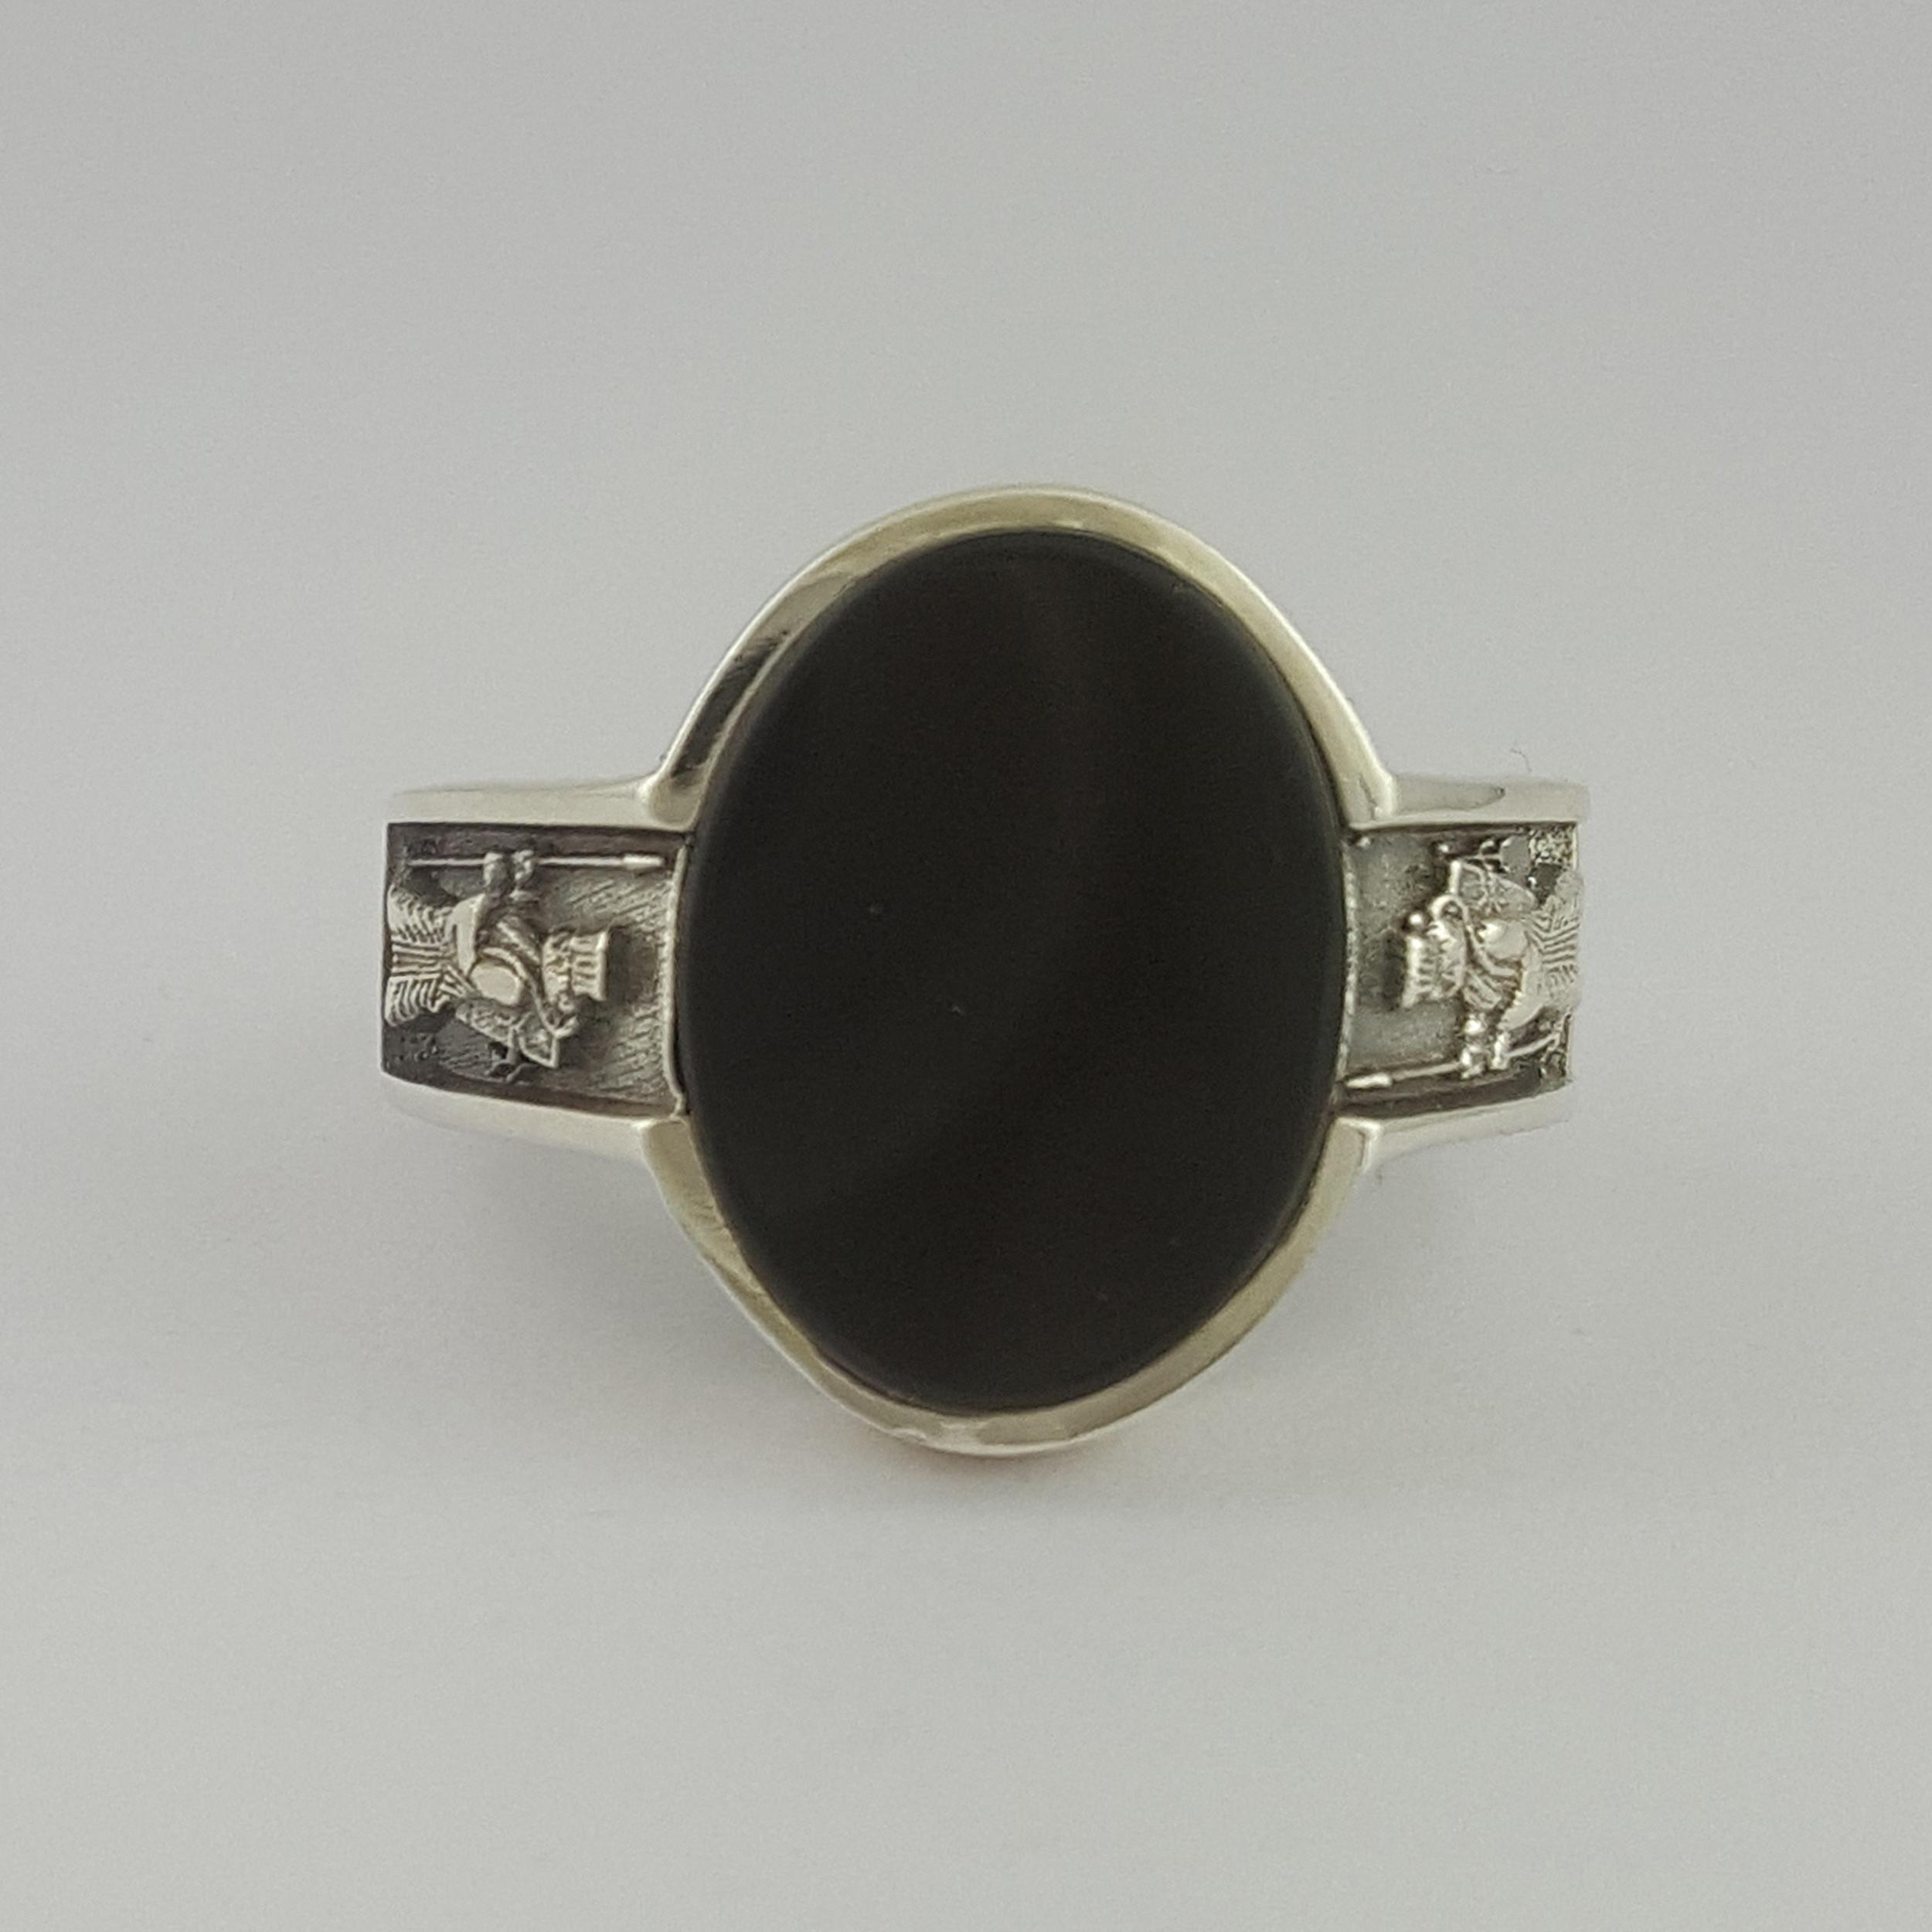 انگشتر نقره مردانه بلو استون کد 1069-65 -  - 6